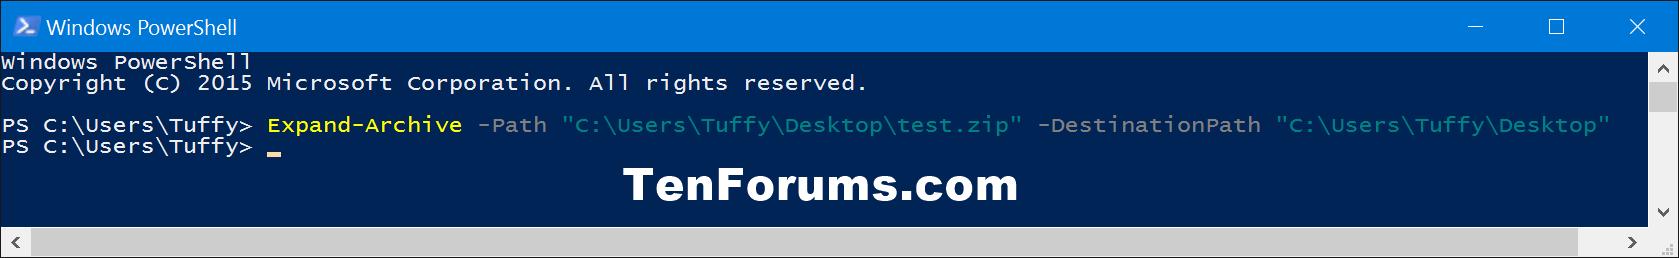 Unzip Files from Zipped Folder in Windows 10 | Tutorials